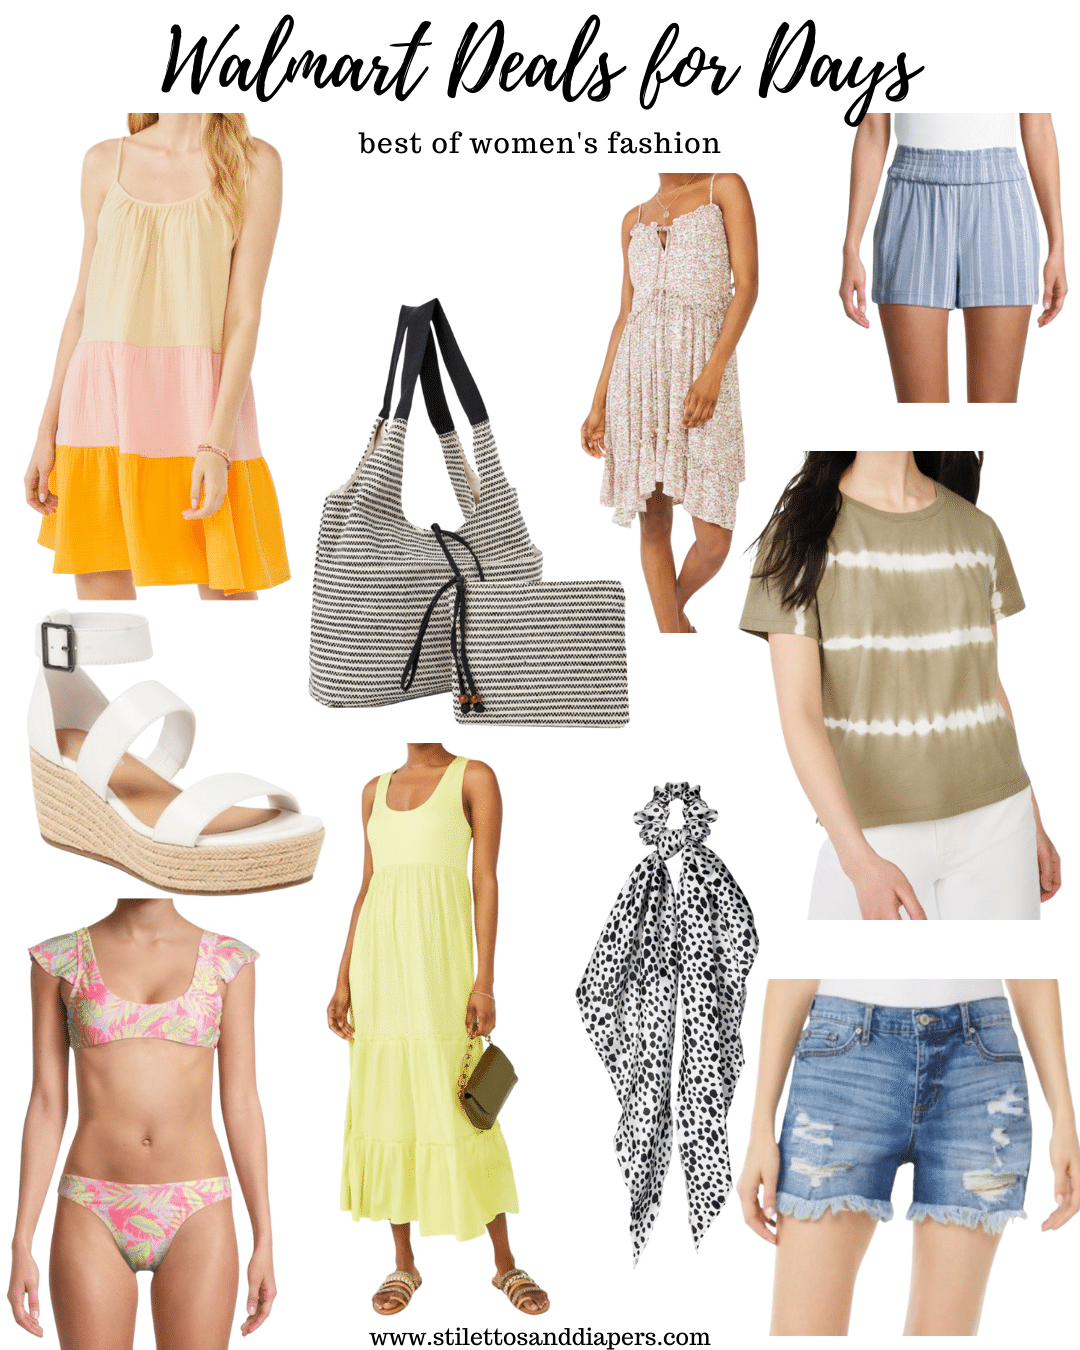 Walmart Deals for Days, Best womens fashion from Walmart